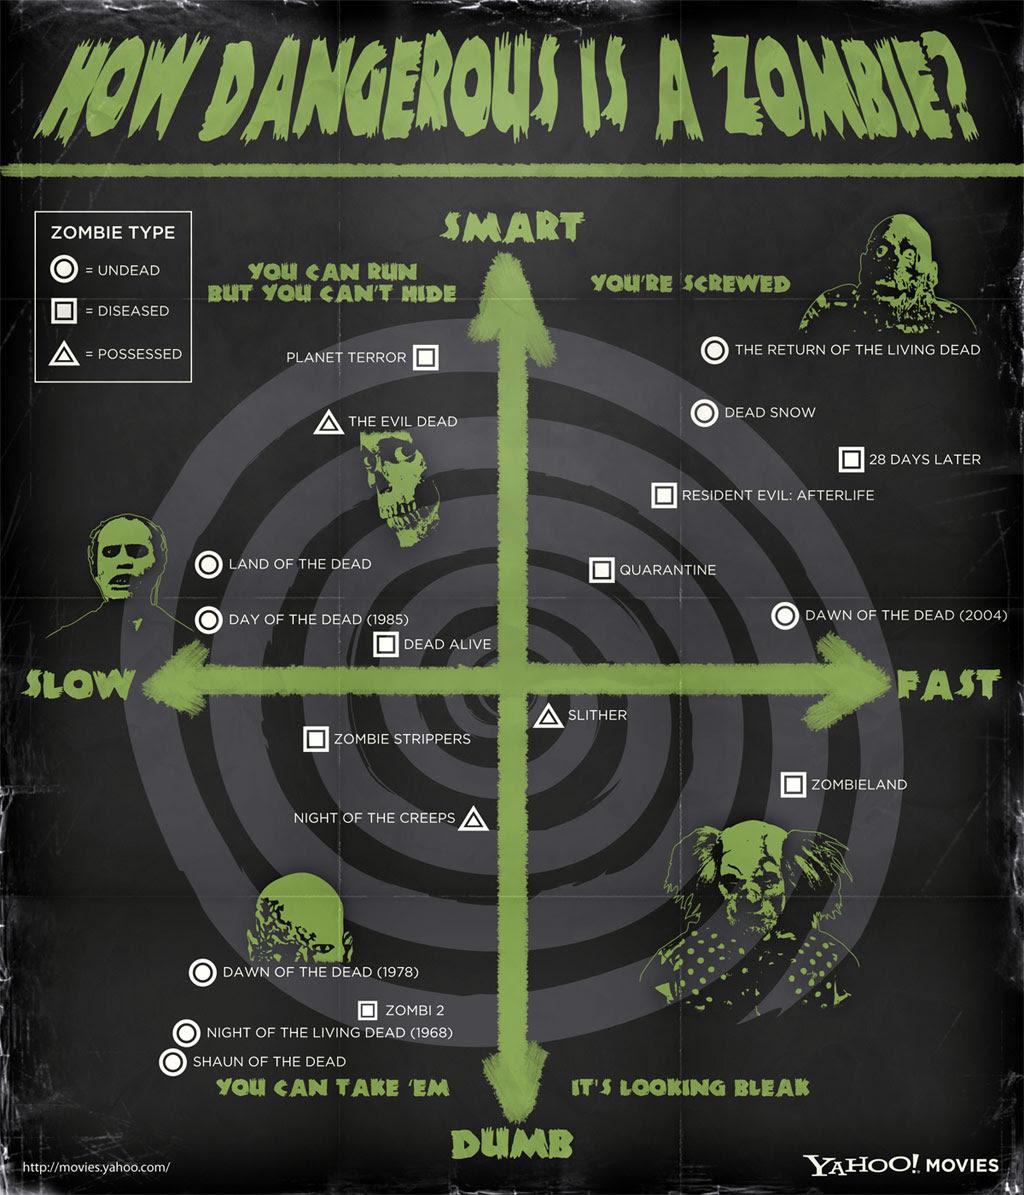 http://l.yimg.com/a/i/mo/zombie_infographic_1024.jpg